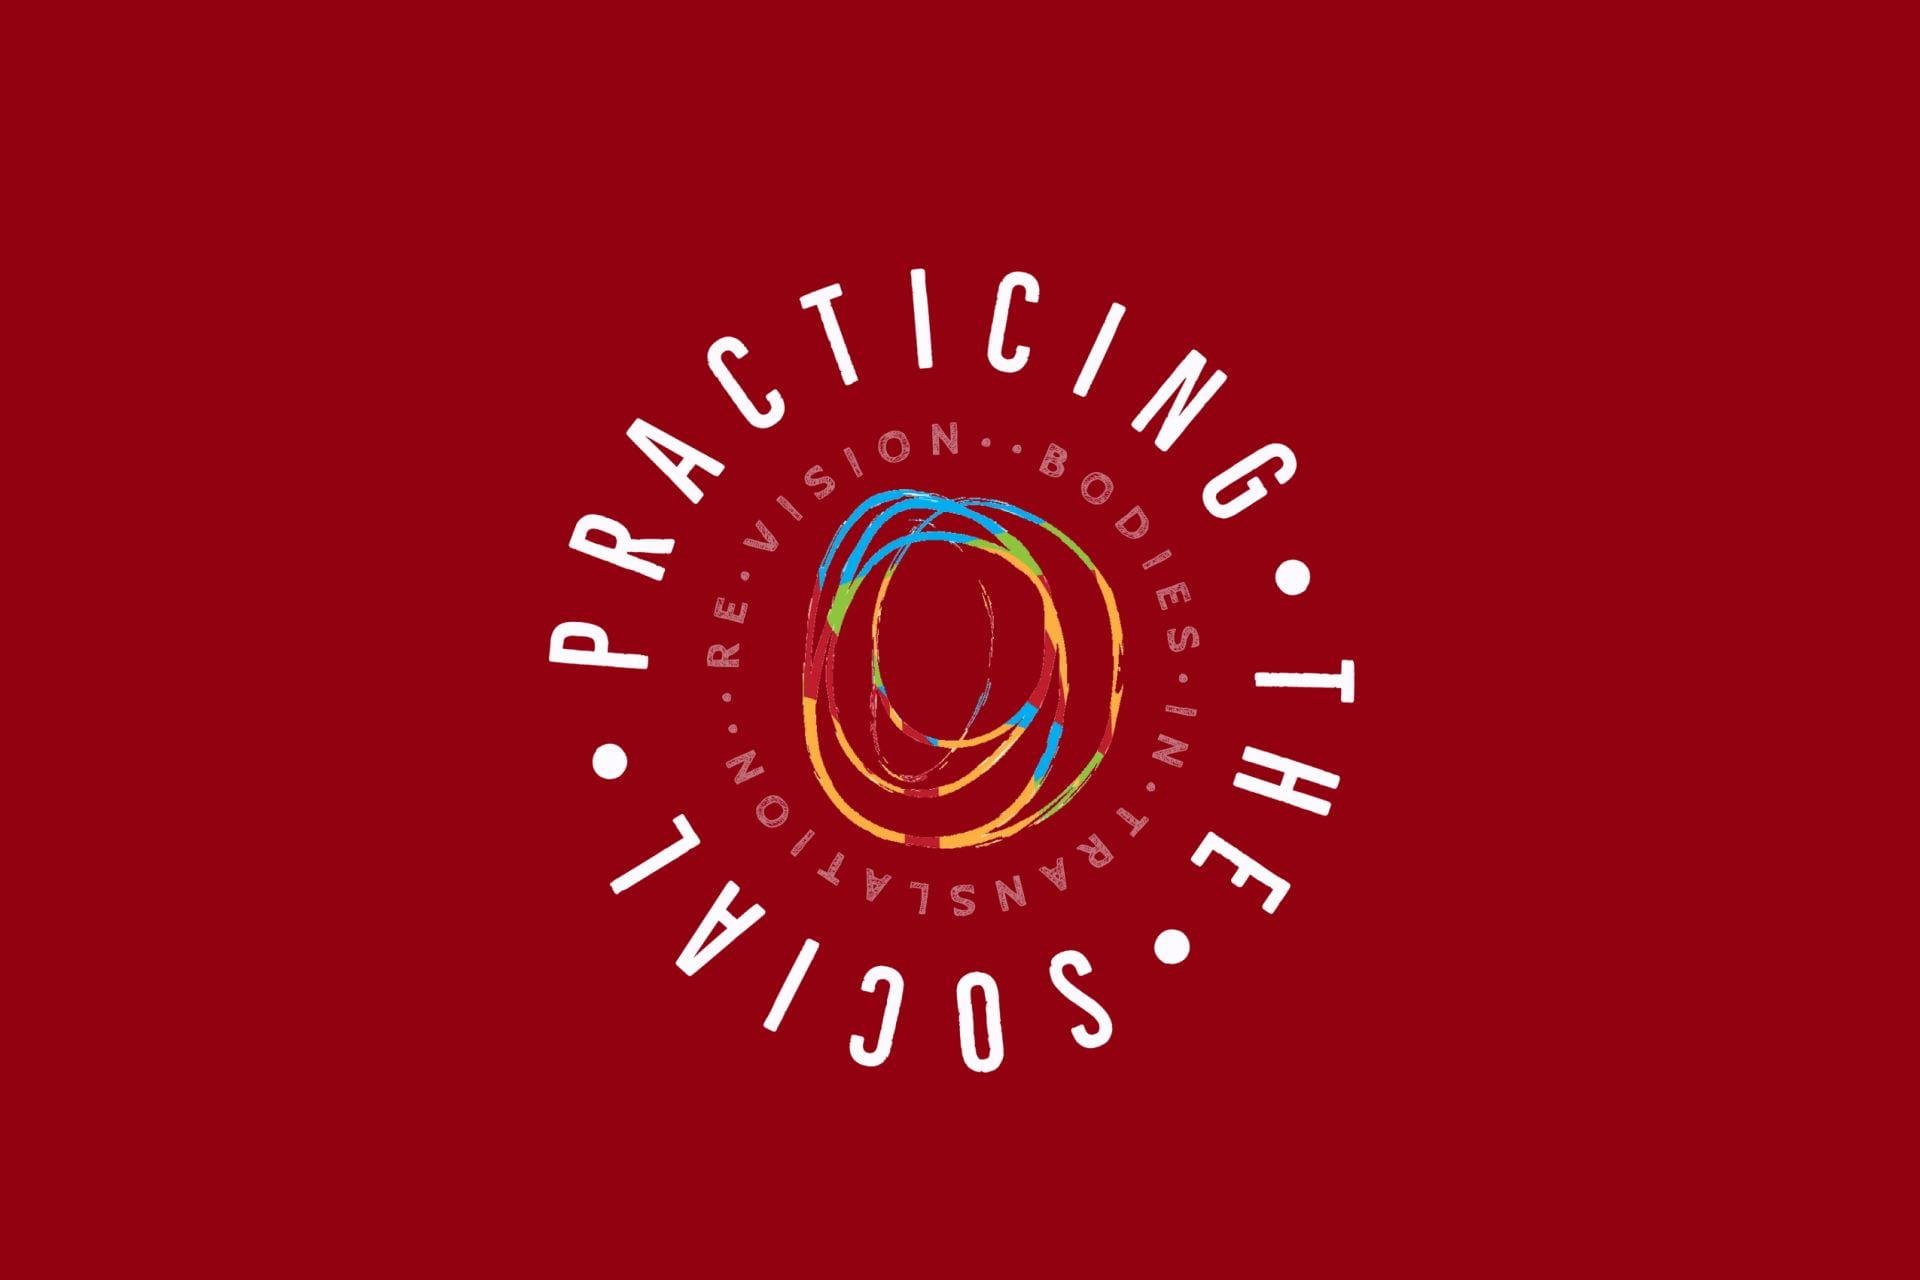 Practicing the Social logo